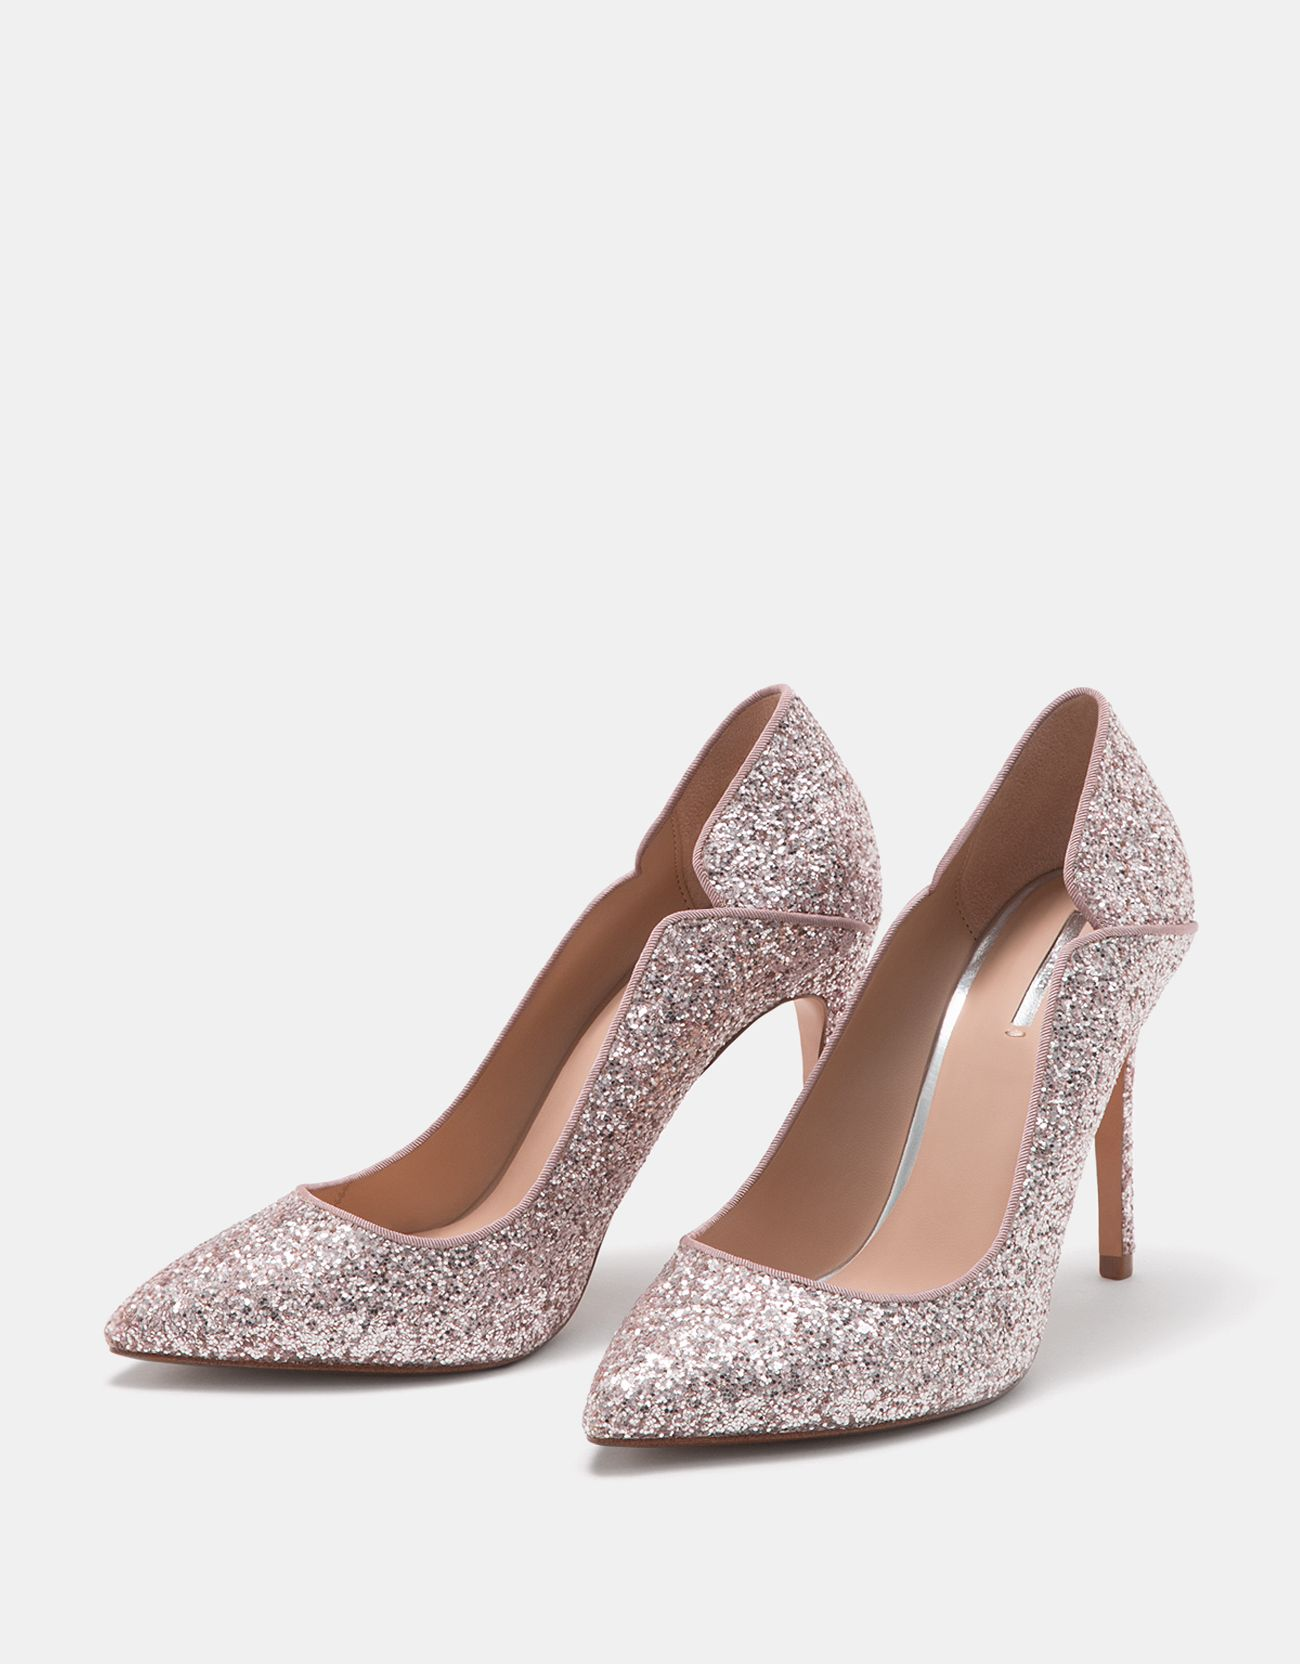 Heels Tacón Zapato Moda Fino Shoes Y Zapatos Brillo Iwzvx4qdz